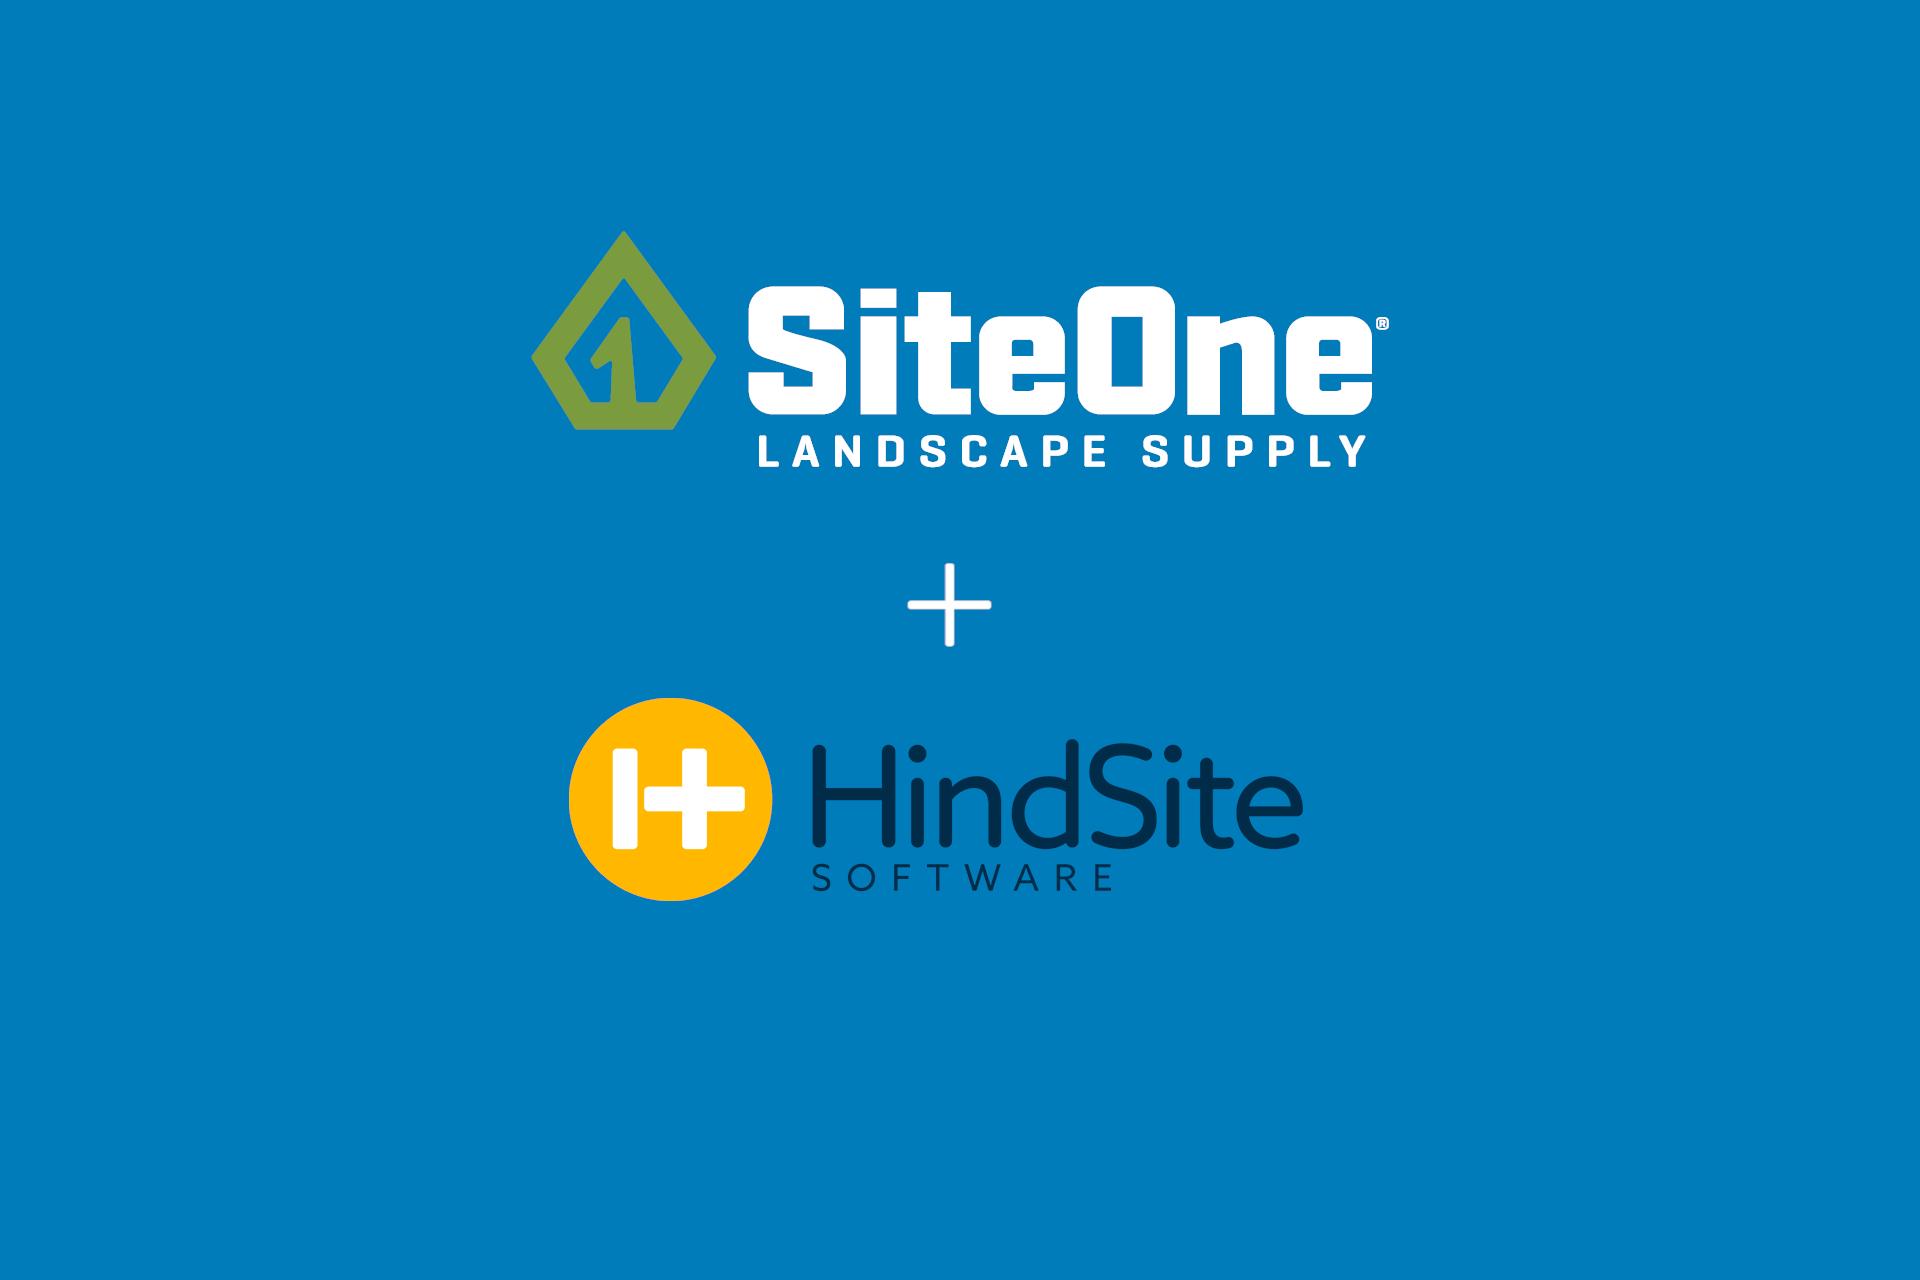 siteone-integration-new-logo